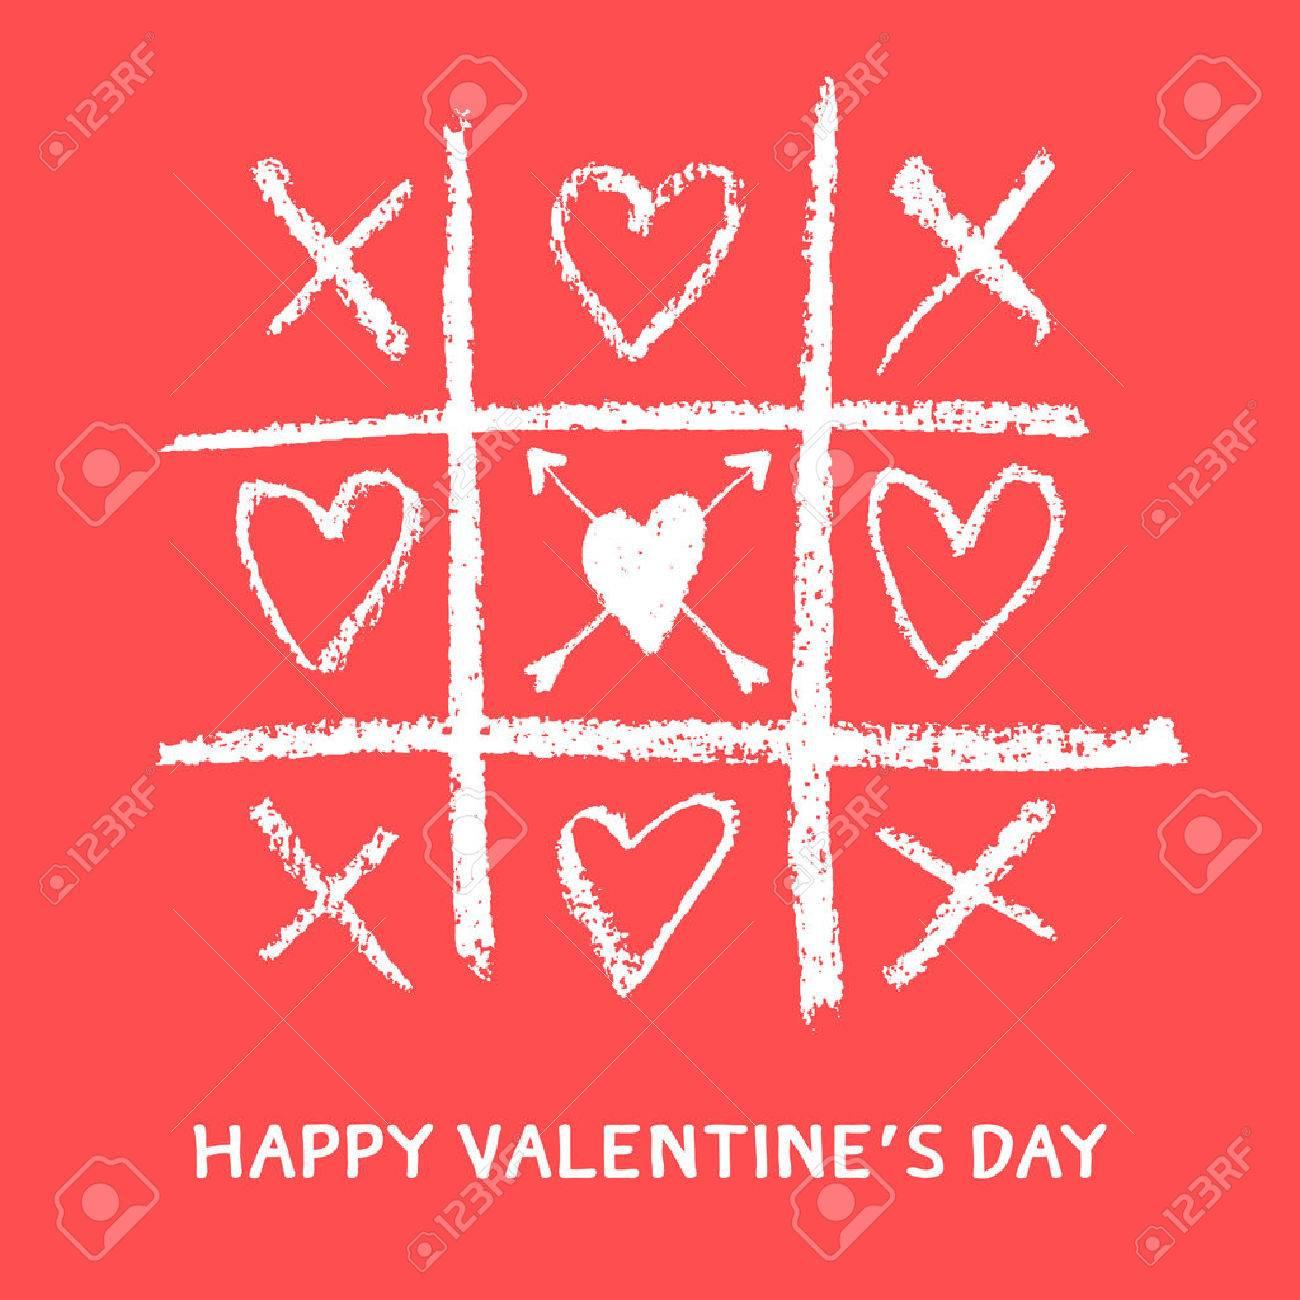 happy valentines day greeting card,xoxo,hug and kiss - 50906843